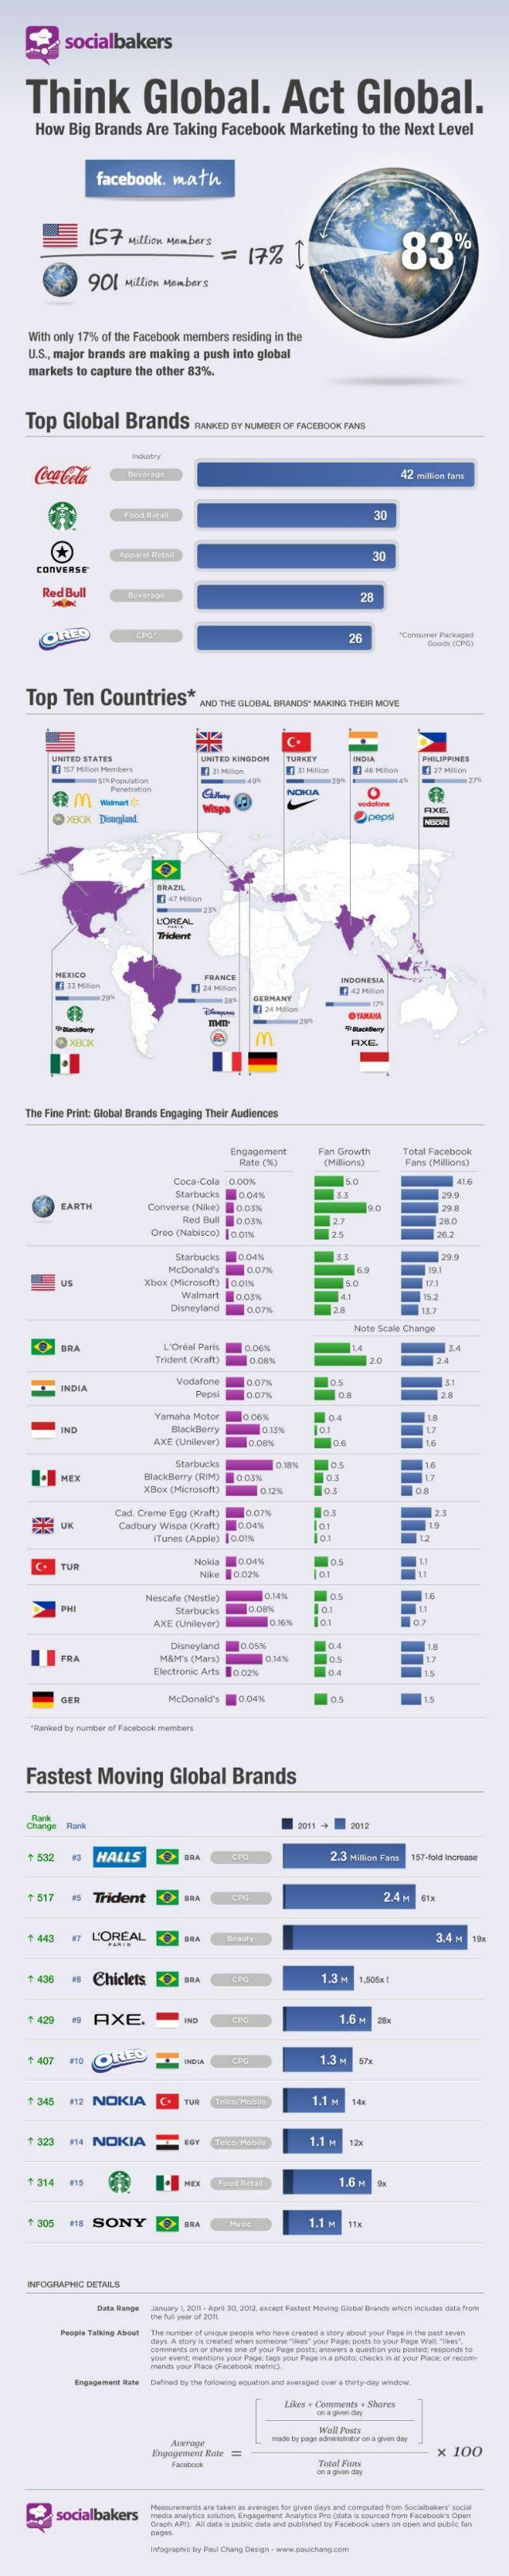 Les marques més populars a Facebook   Las marcas más populares en Facebook Internet Site, Marketing Strategies, Social Media, Big Brand, Global Brand, Facebook Infographic, Facebook Marketing, Socialmedia, The Brand